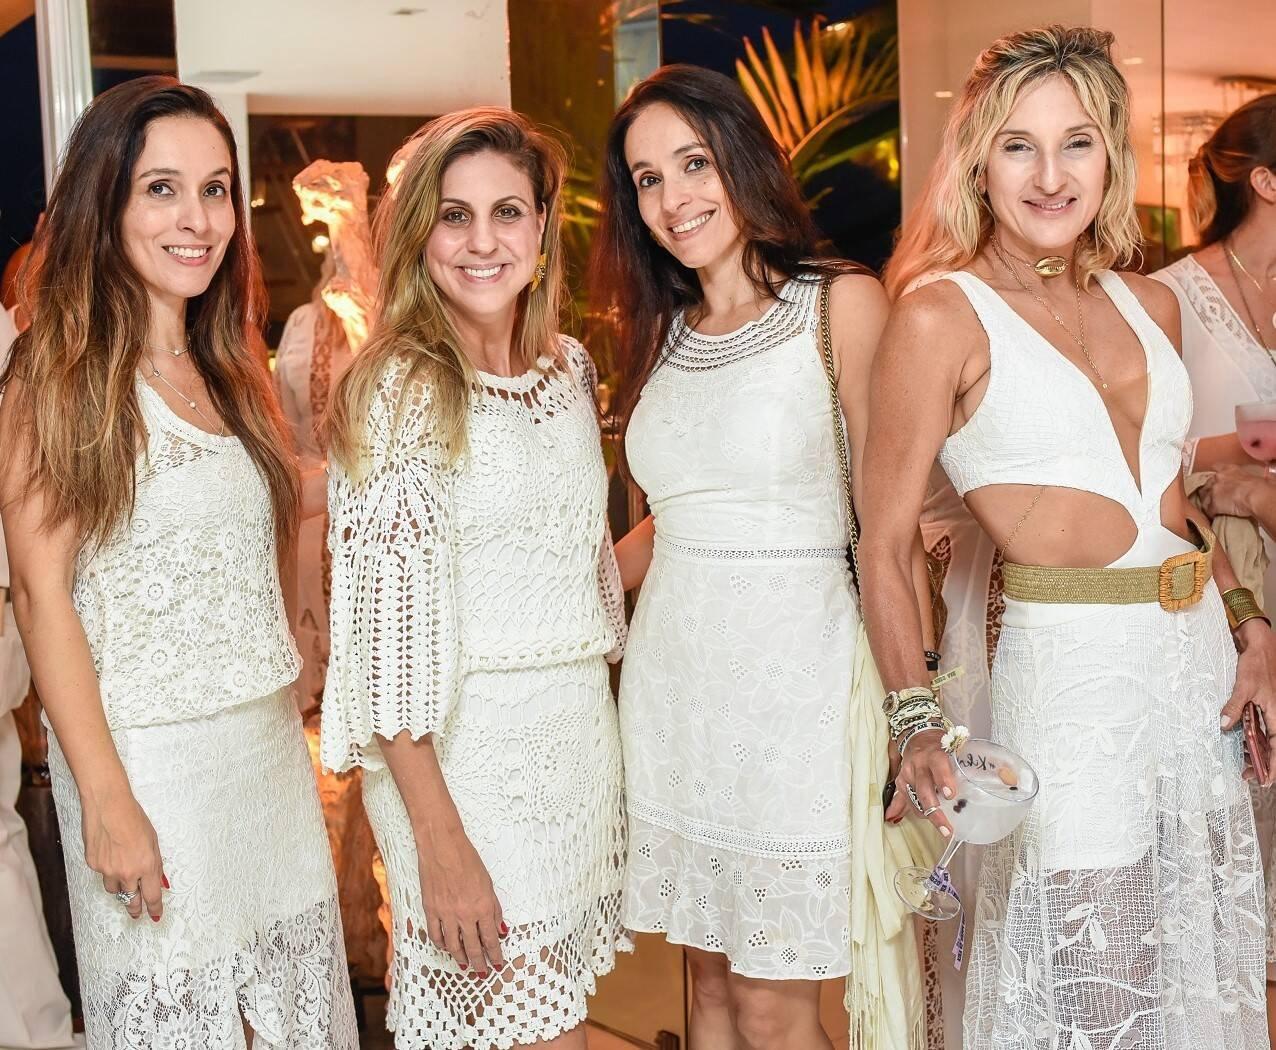 Andrea Meireles, Janine Saad, Daniela Meireles e Ursula Mandiano /Foto: Mariama Prieto